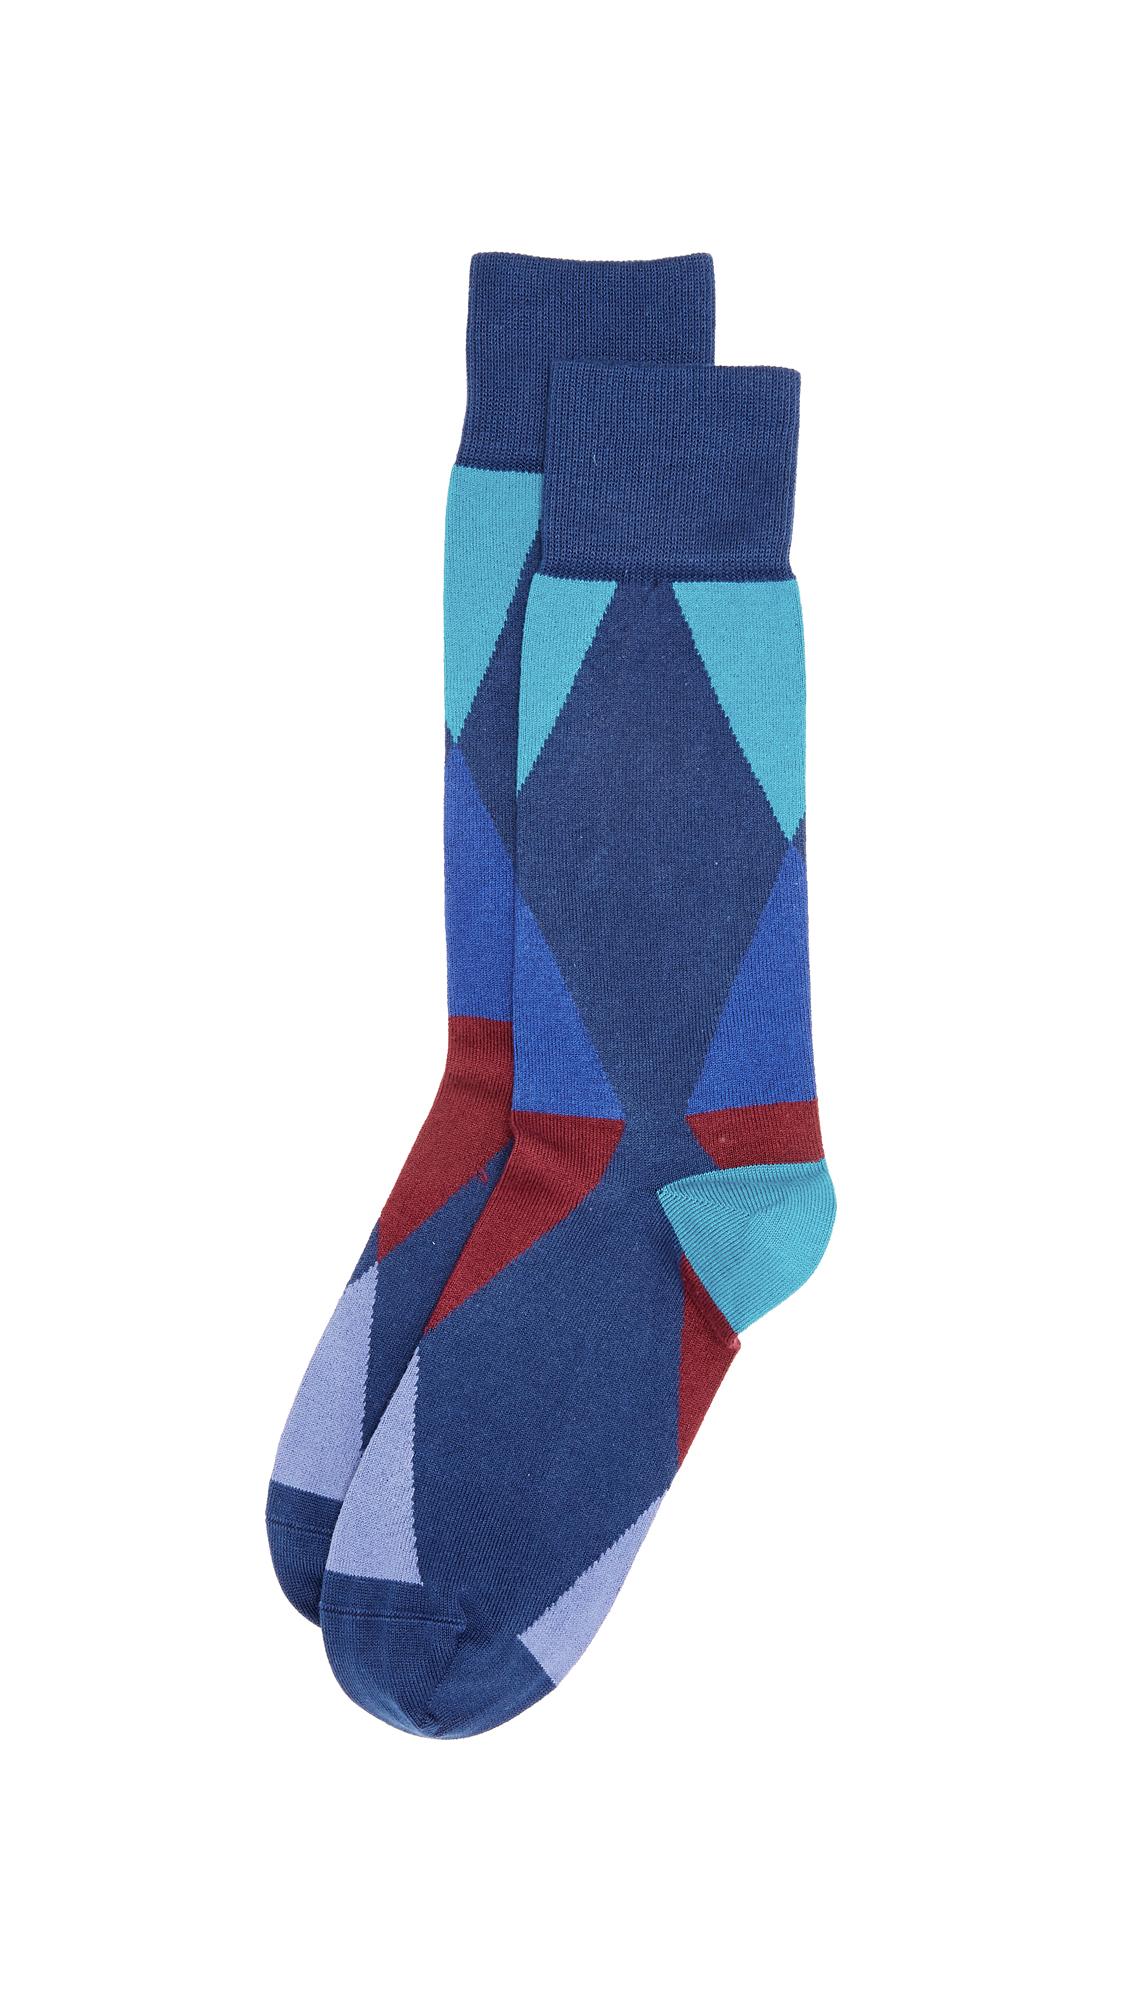 Paul Smith 'Geometric Triangle' Socks In Blue Multi